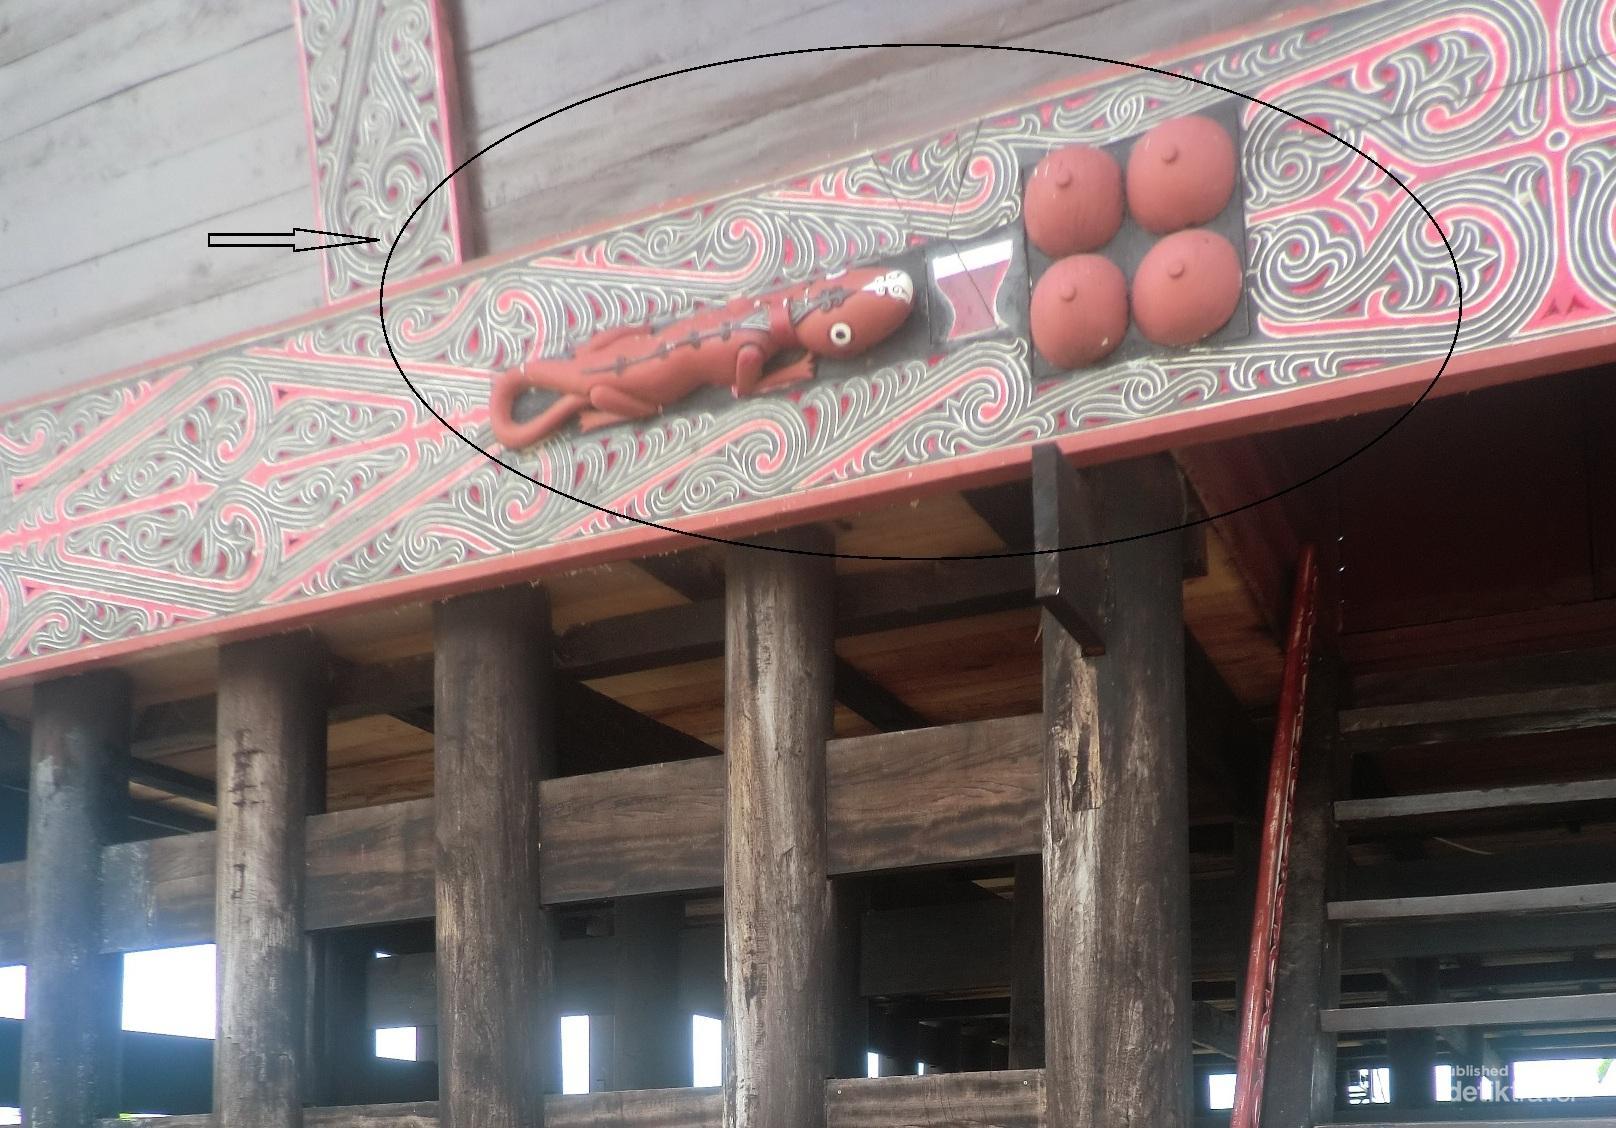 Cicak, Simbol Unik Suku Batak untuk Bertahan Hidup